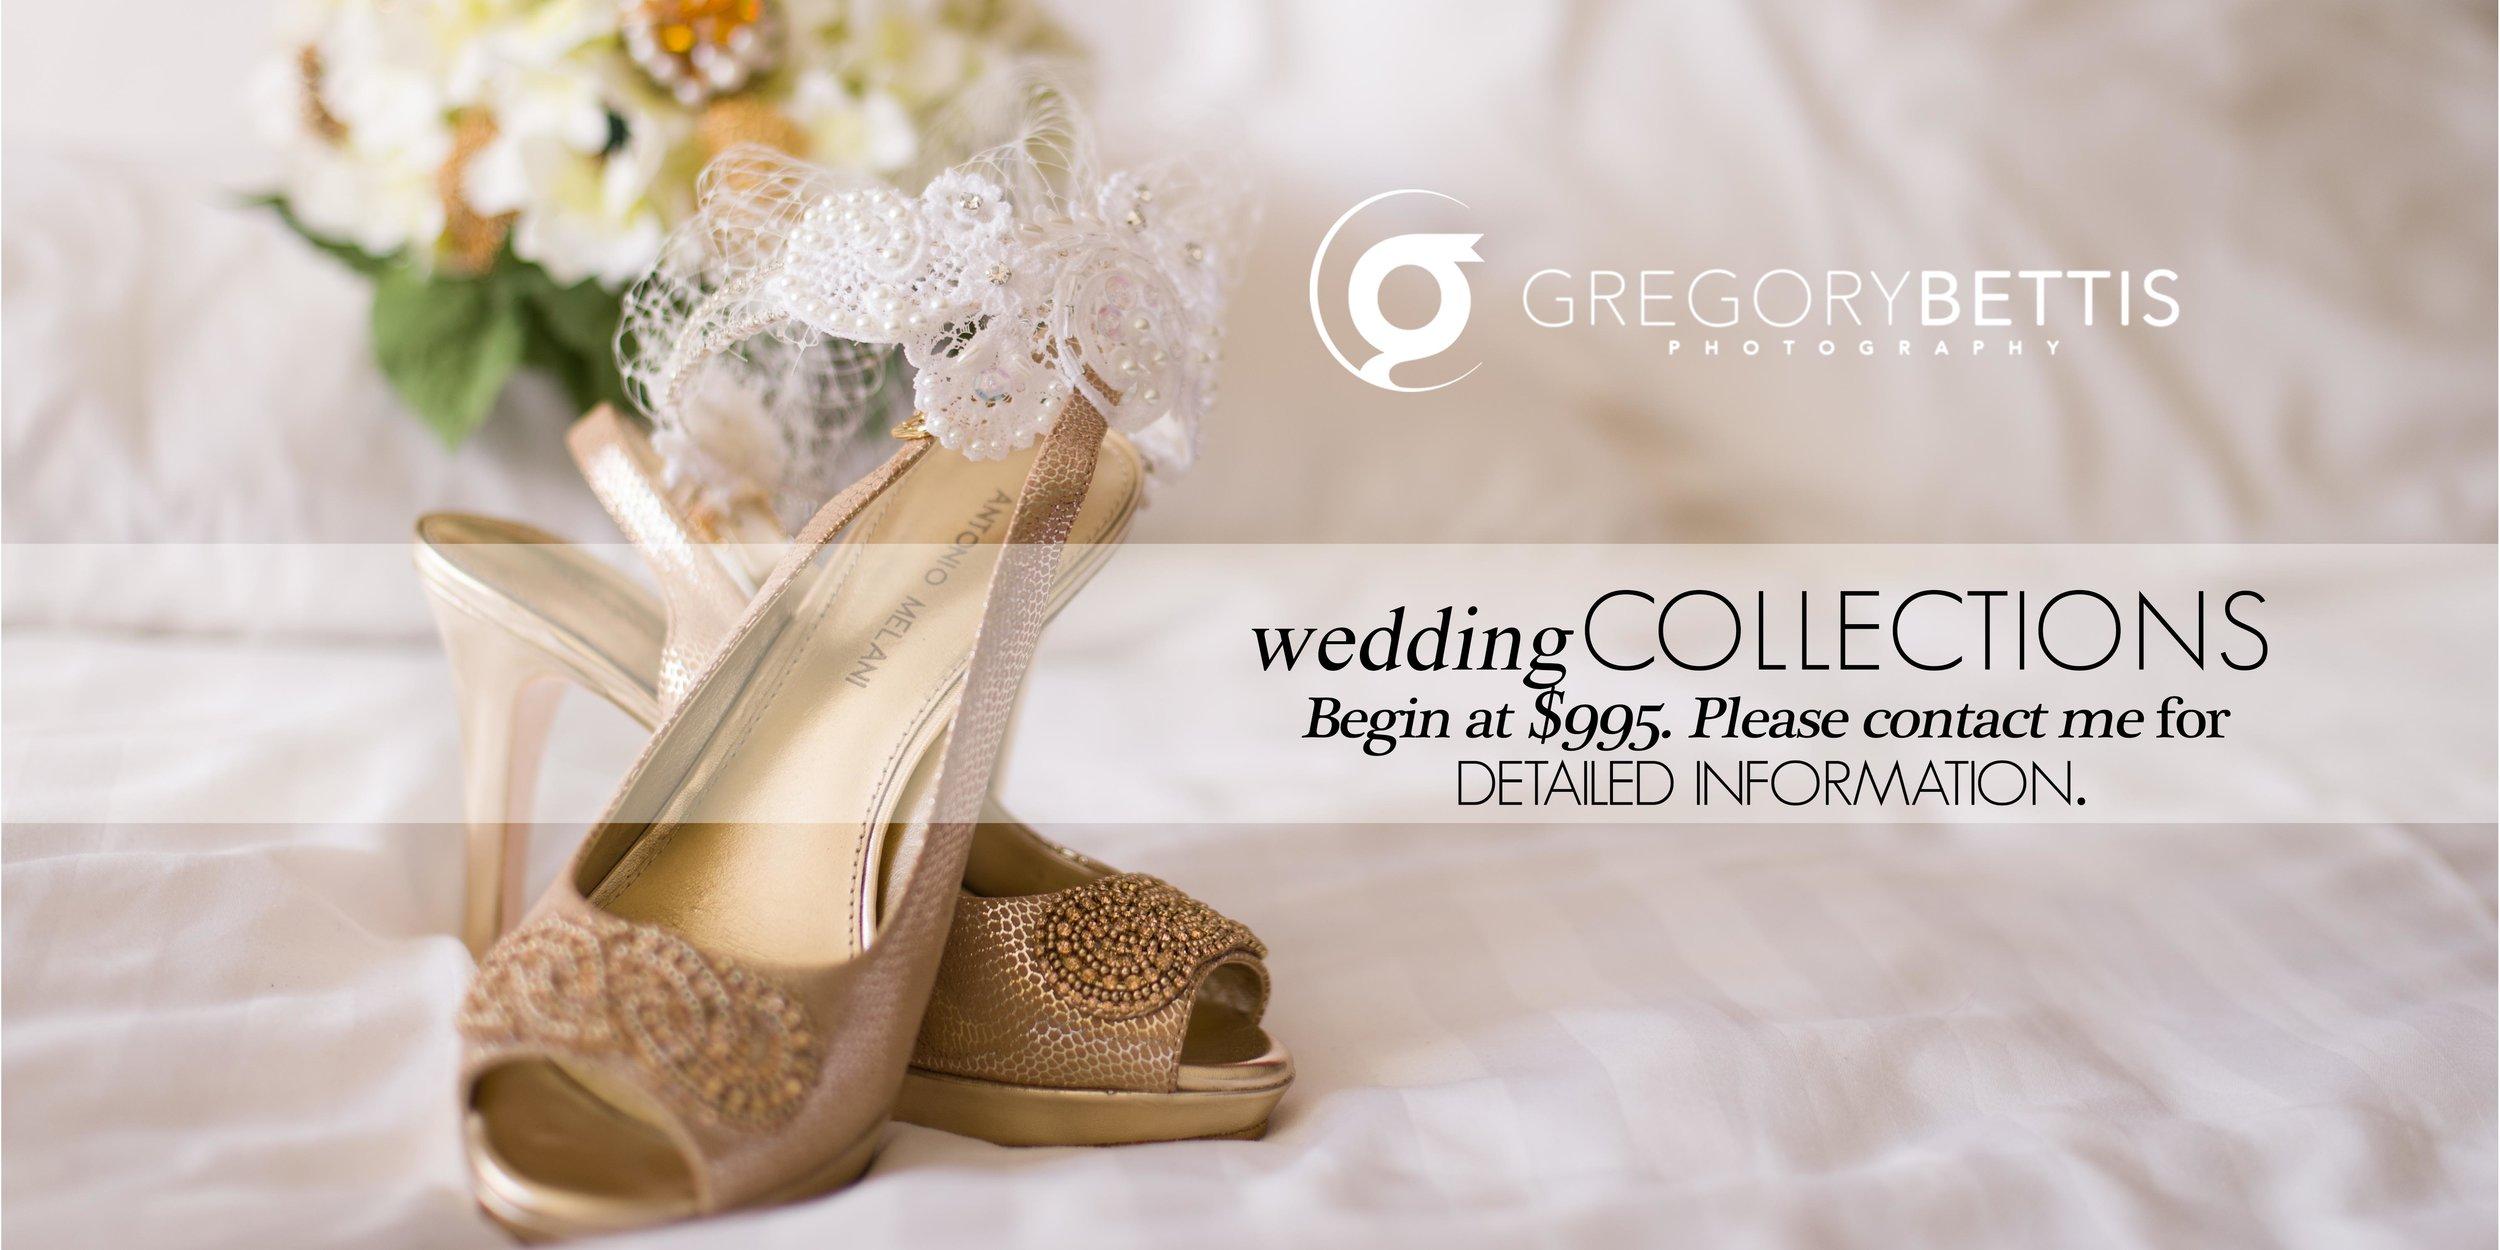 wedding pricing 995.jpg